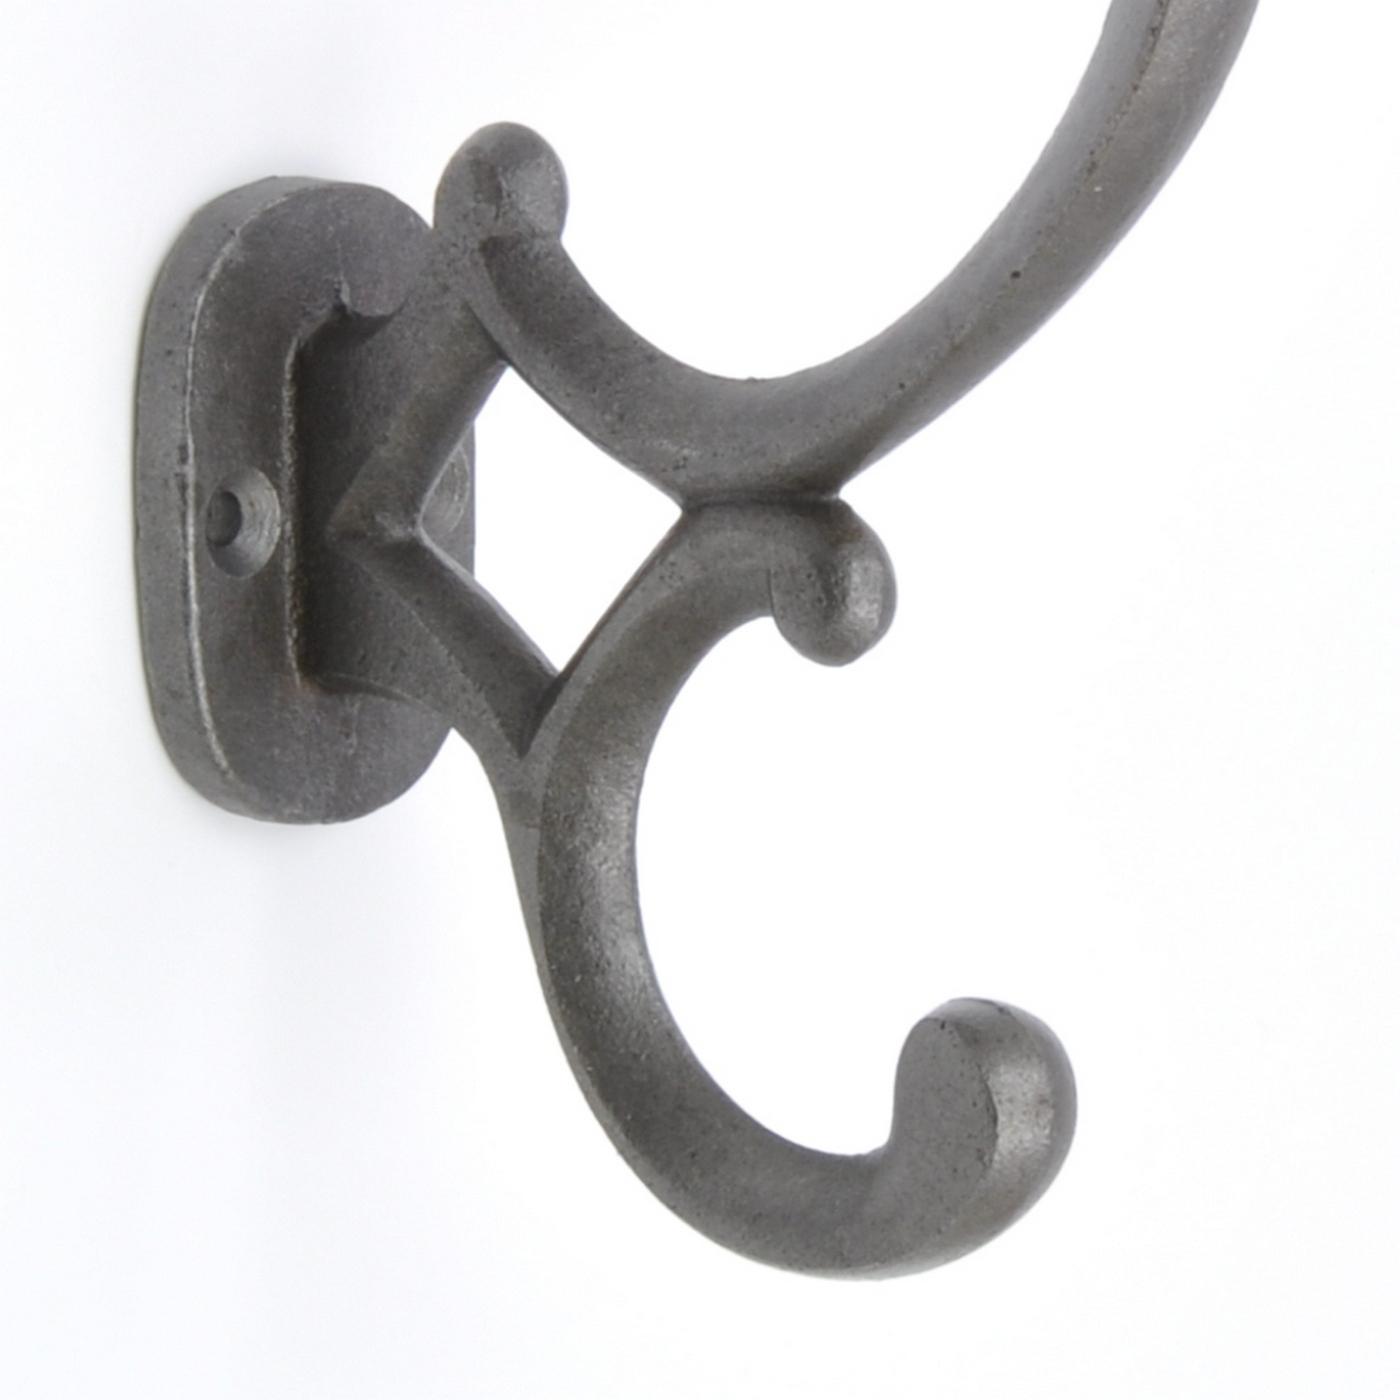 Classical Decorative Grey Metal Coat Hook Hooks Wall ...